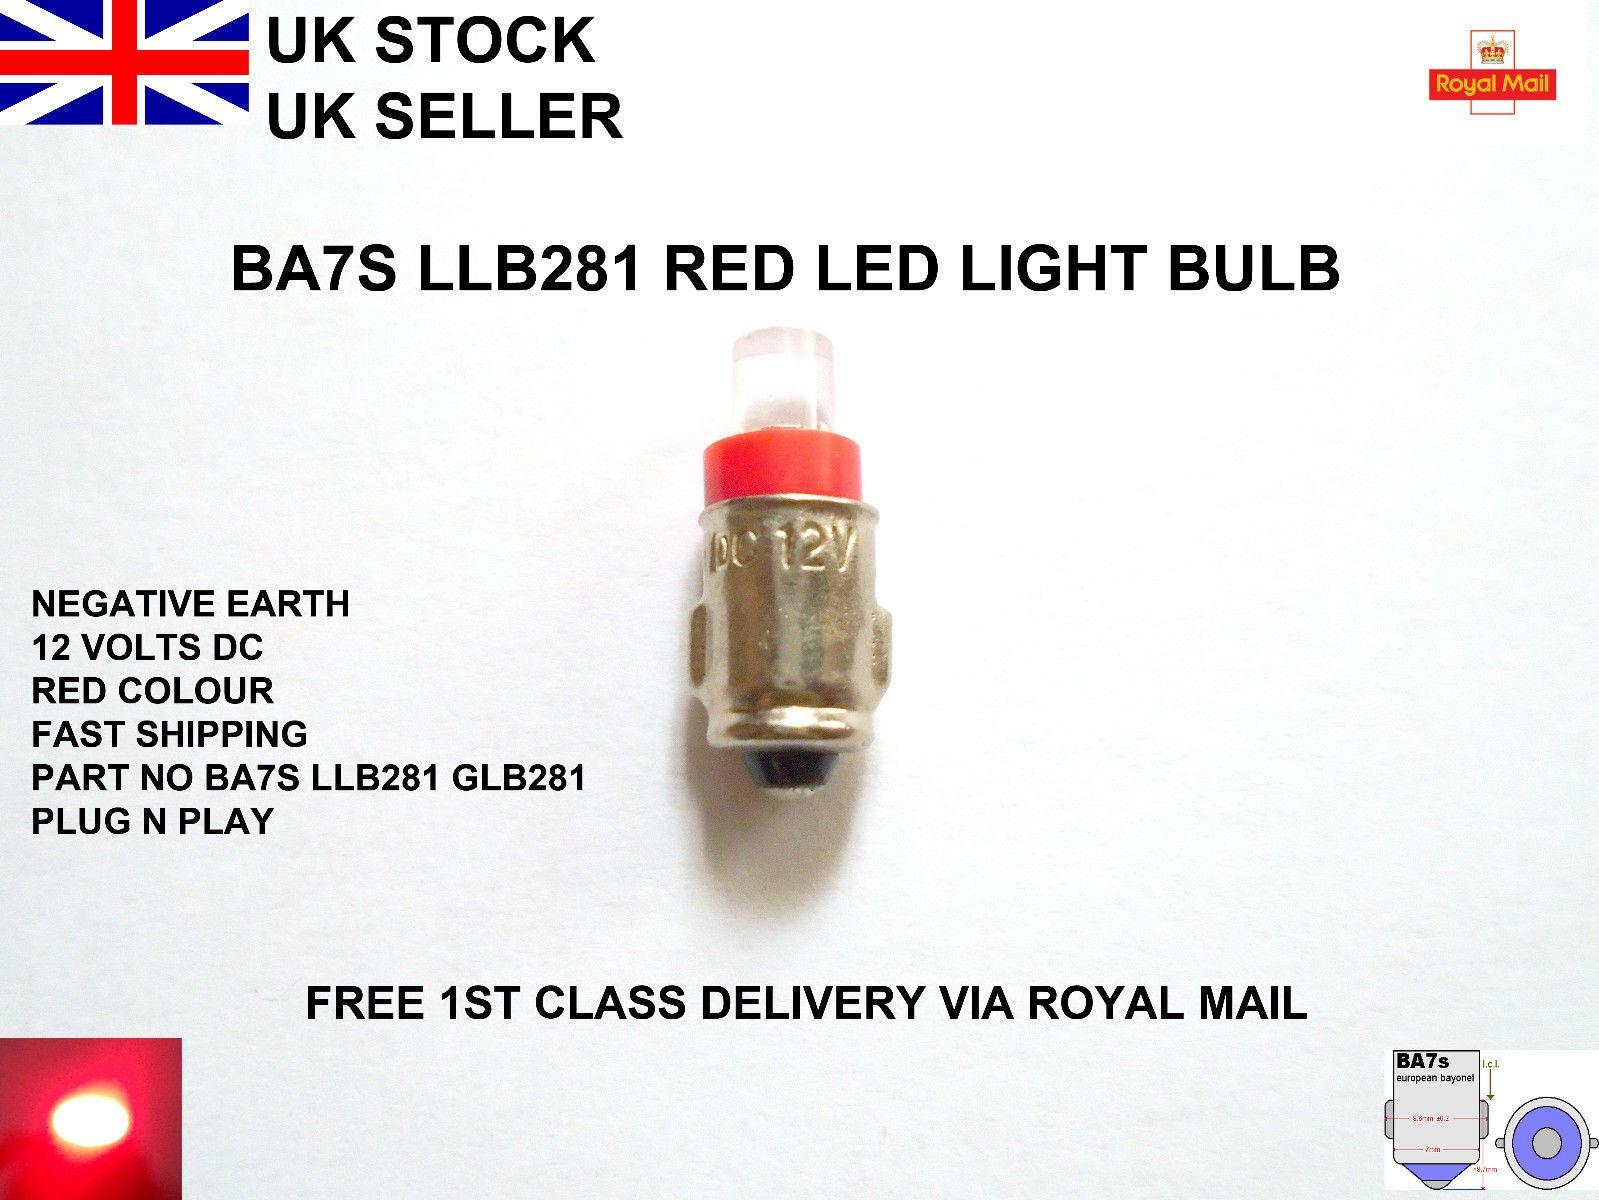 12v 1.2w W2x4.6d Dashboard Panel Instrument Replacement Bulbs 286 x 10 Speedo